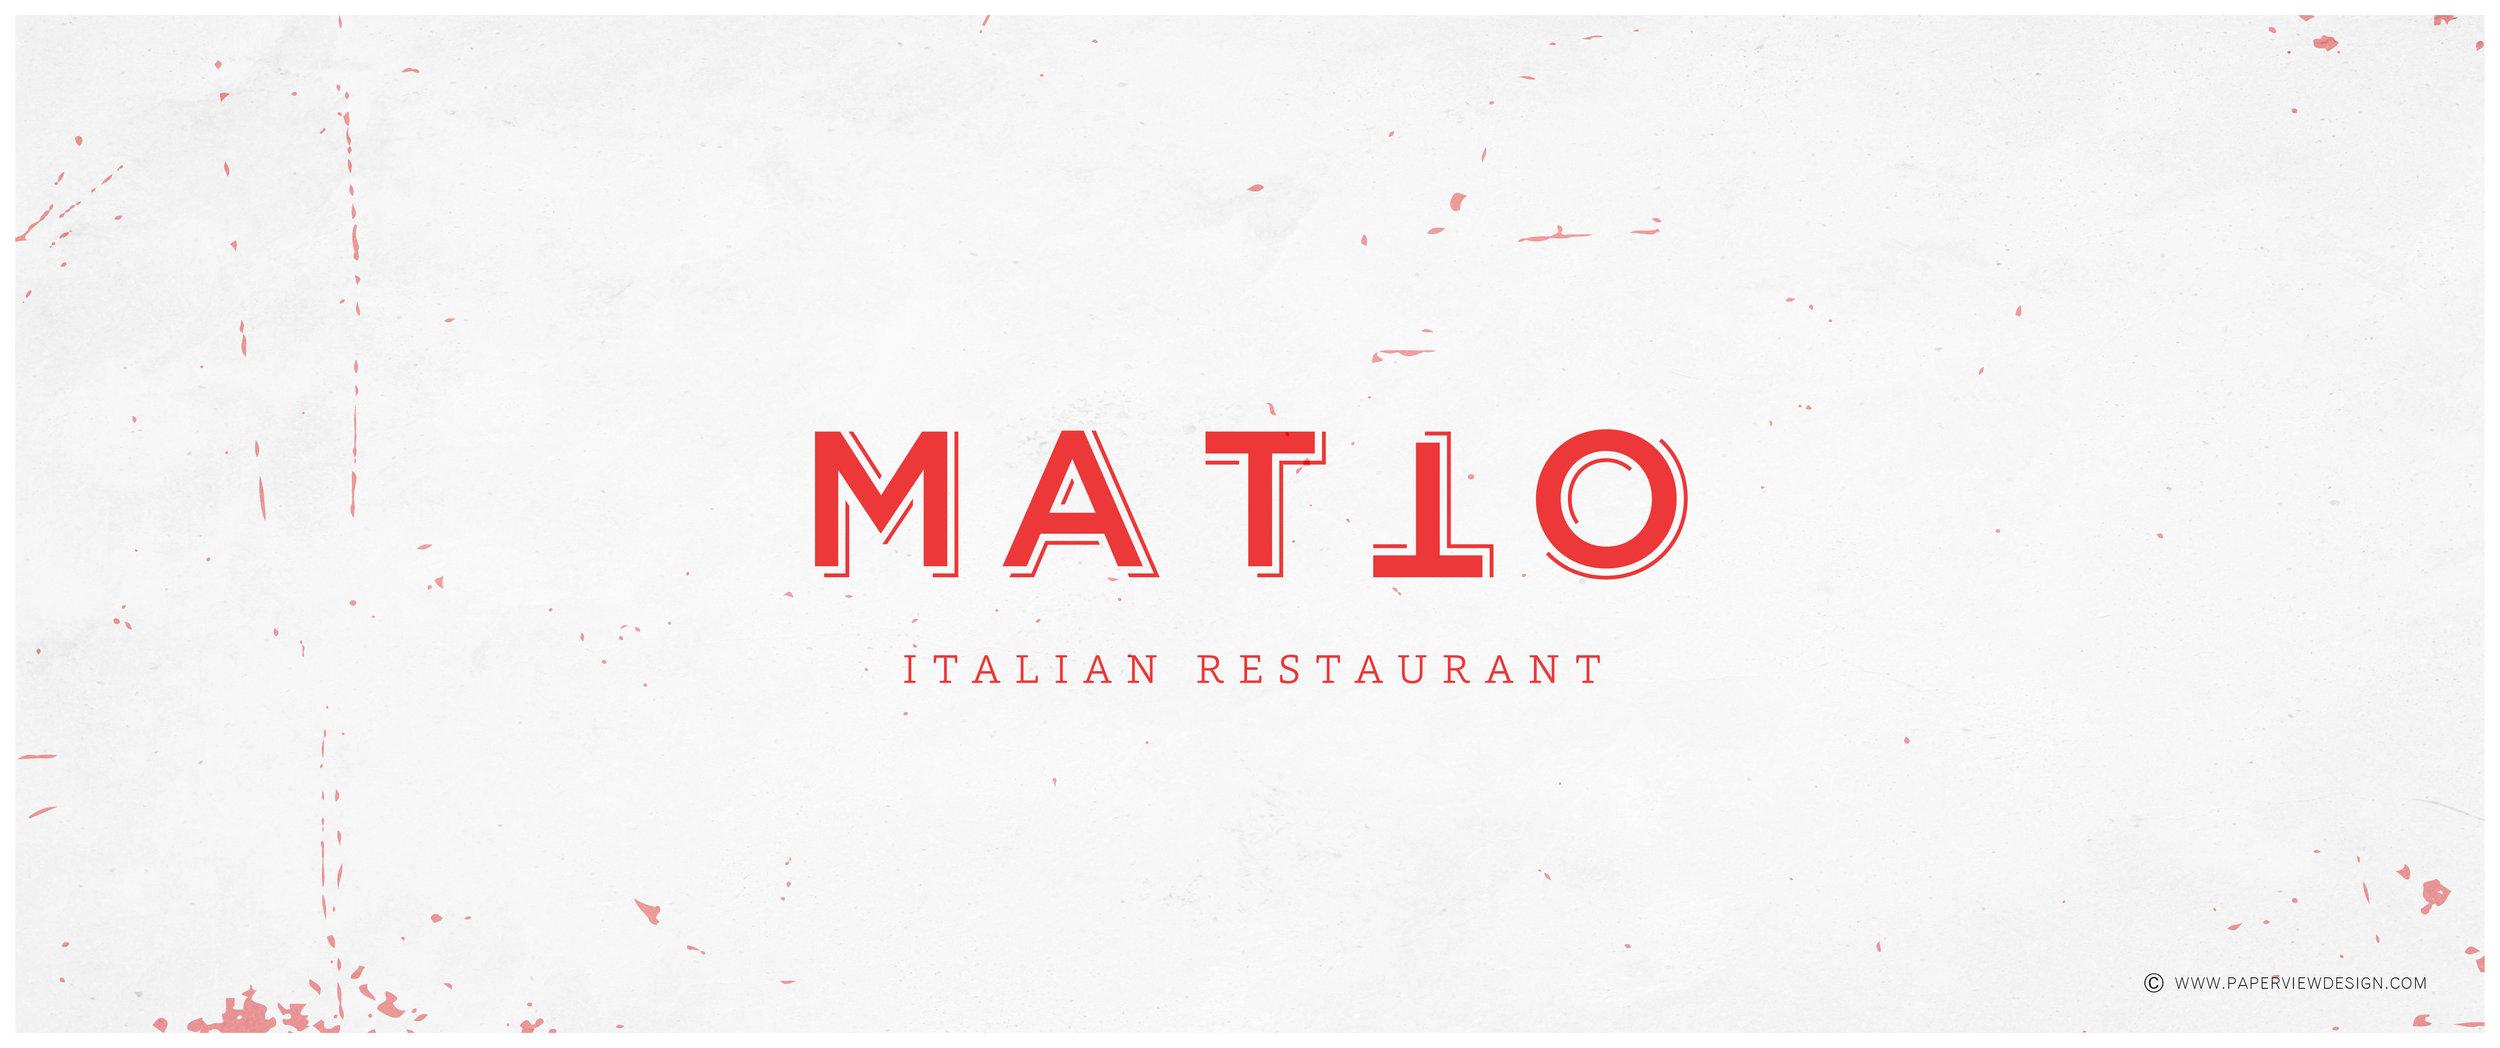 Logo-Red-Design-Texture-Concrete-Matto-Italian-Cuisine-Kitchen-Restaurant